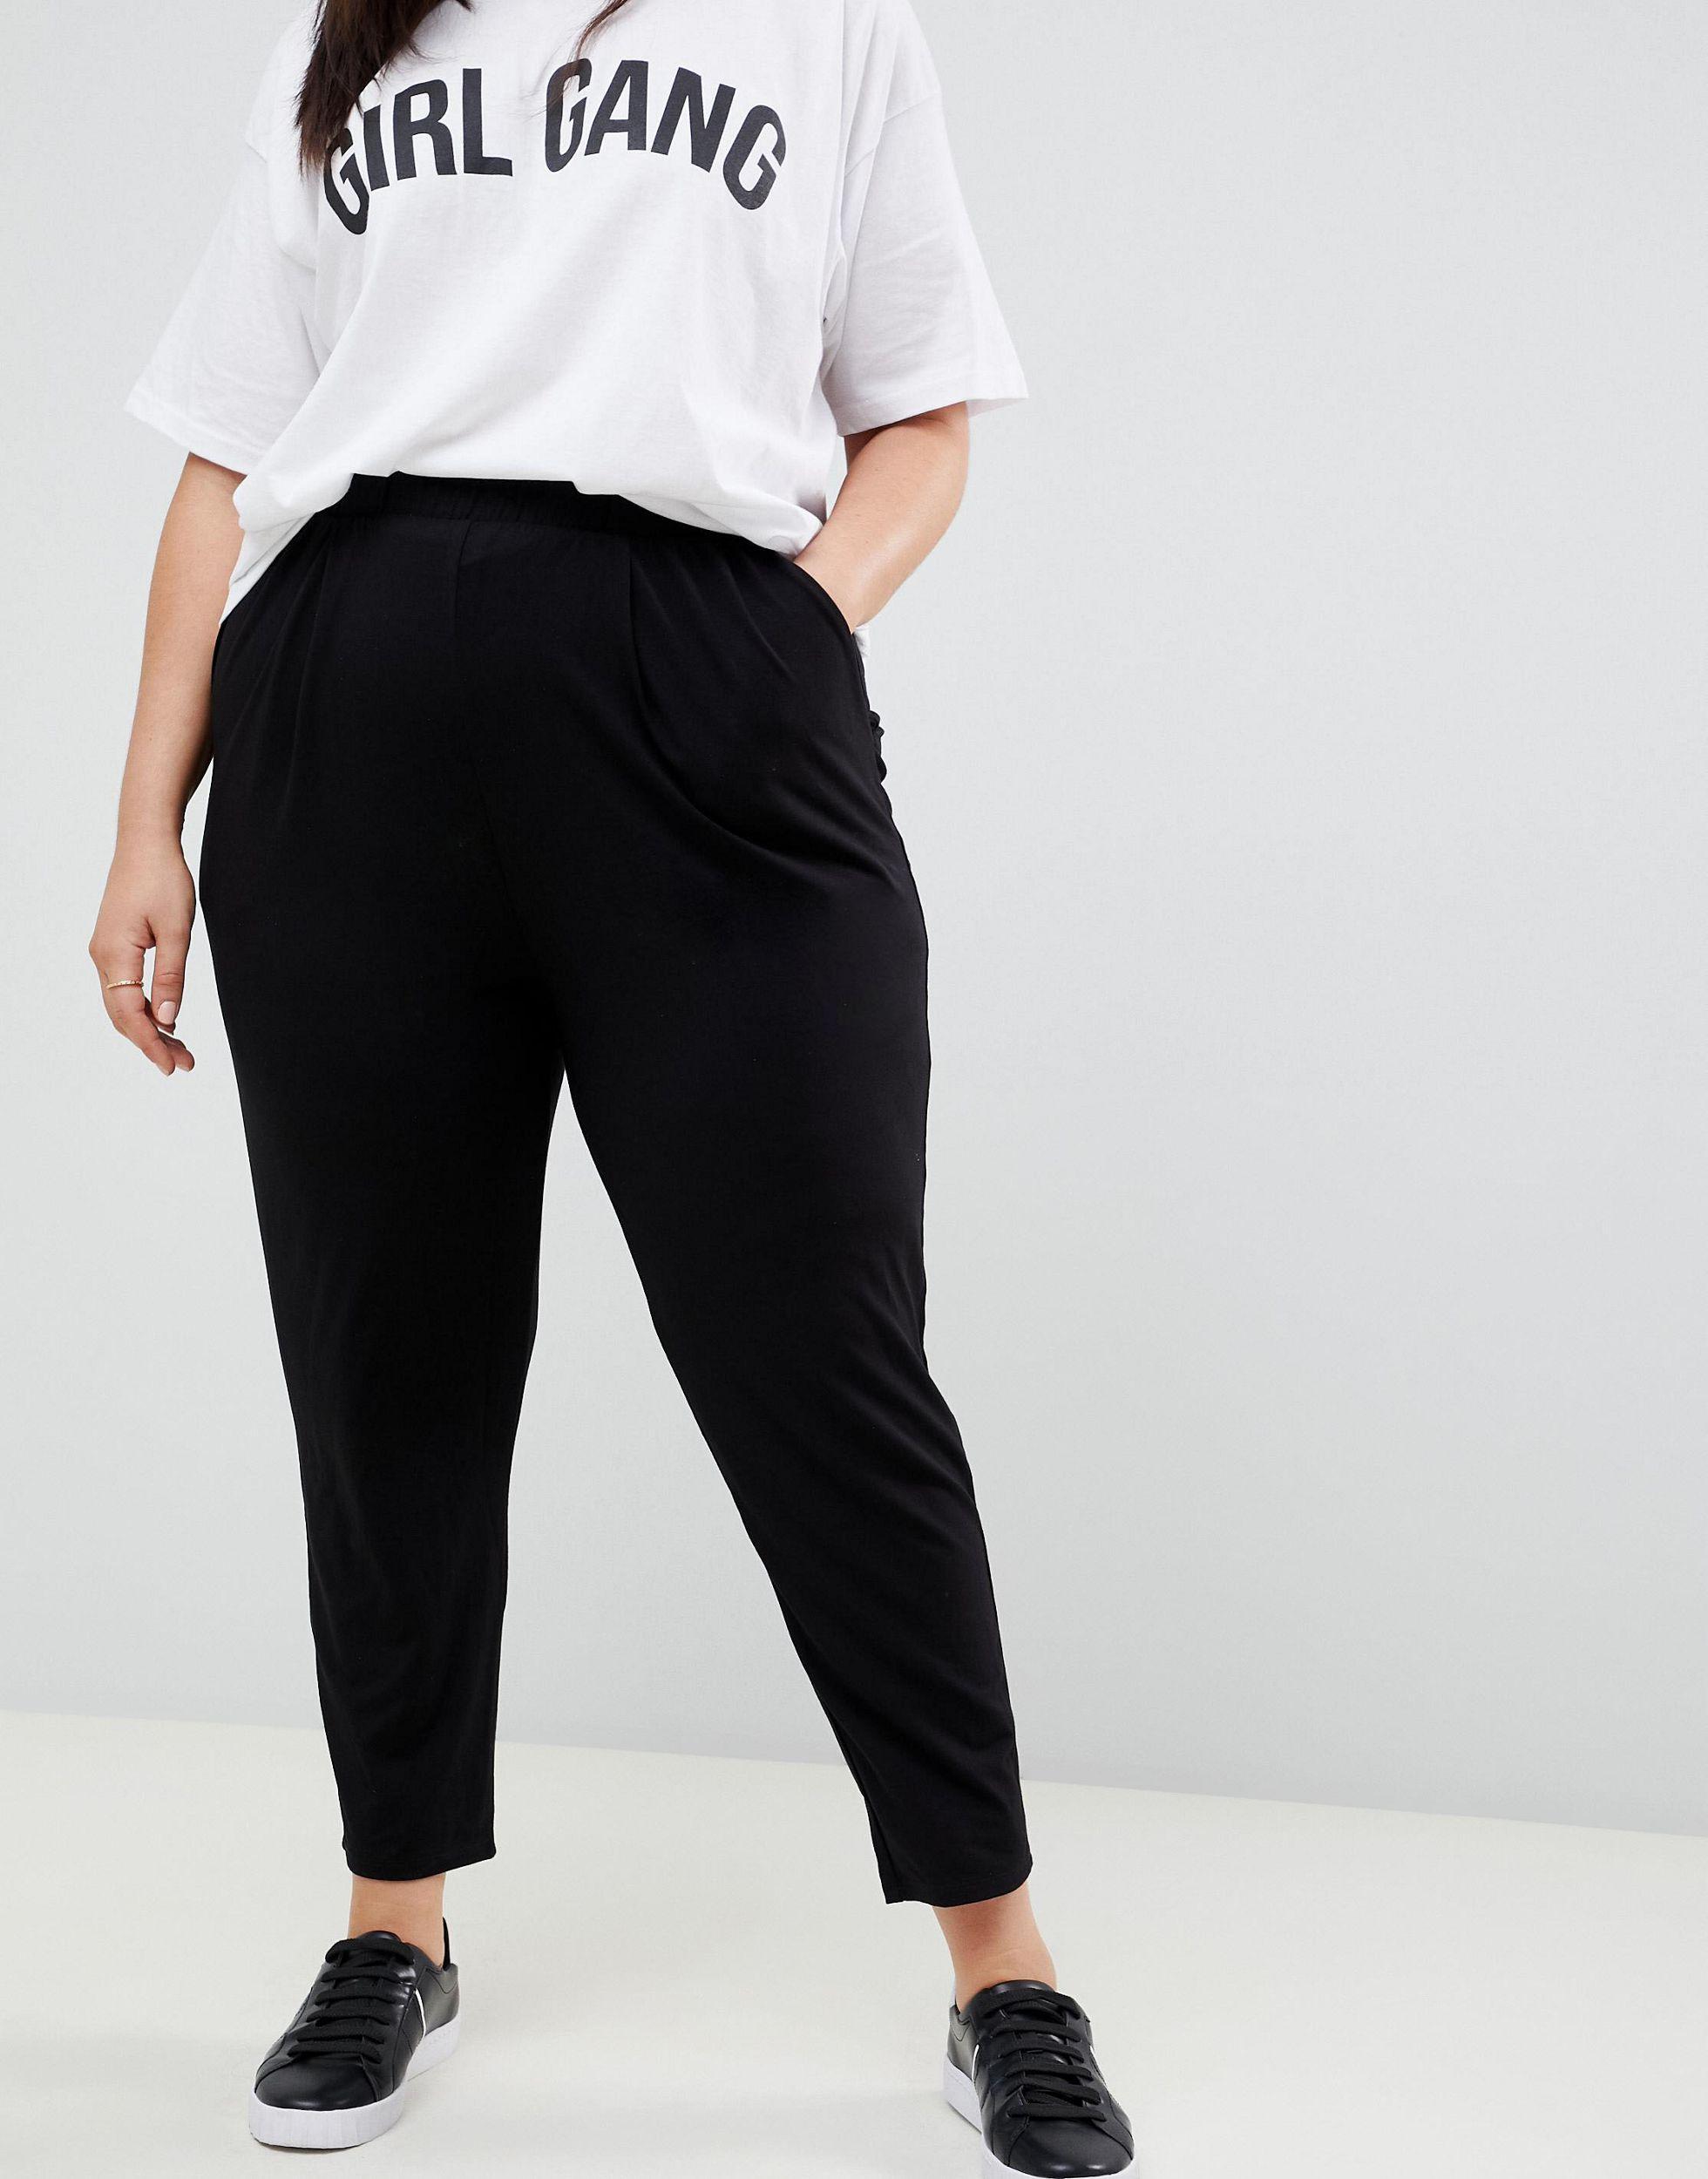 ASOS DESIGN Curve - Ultimate - Pantalon carotte en jersey Jean ASOS en coloris Noir